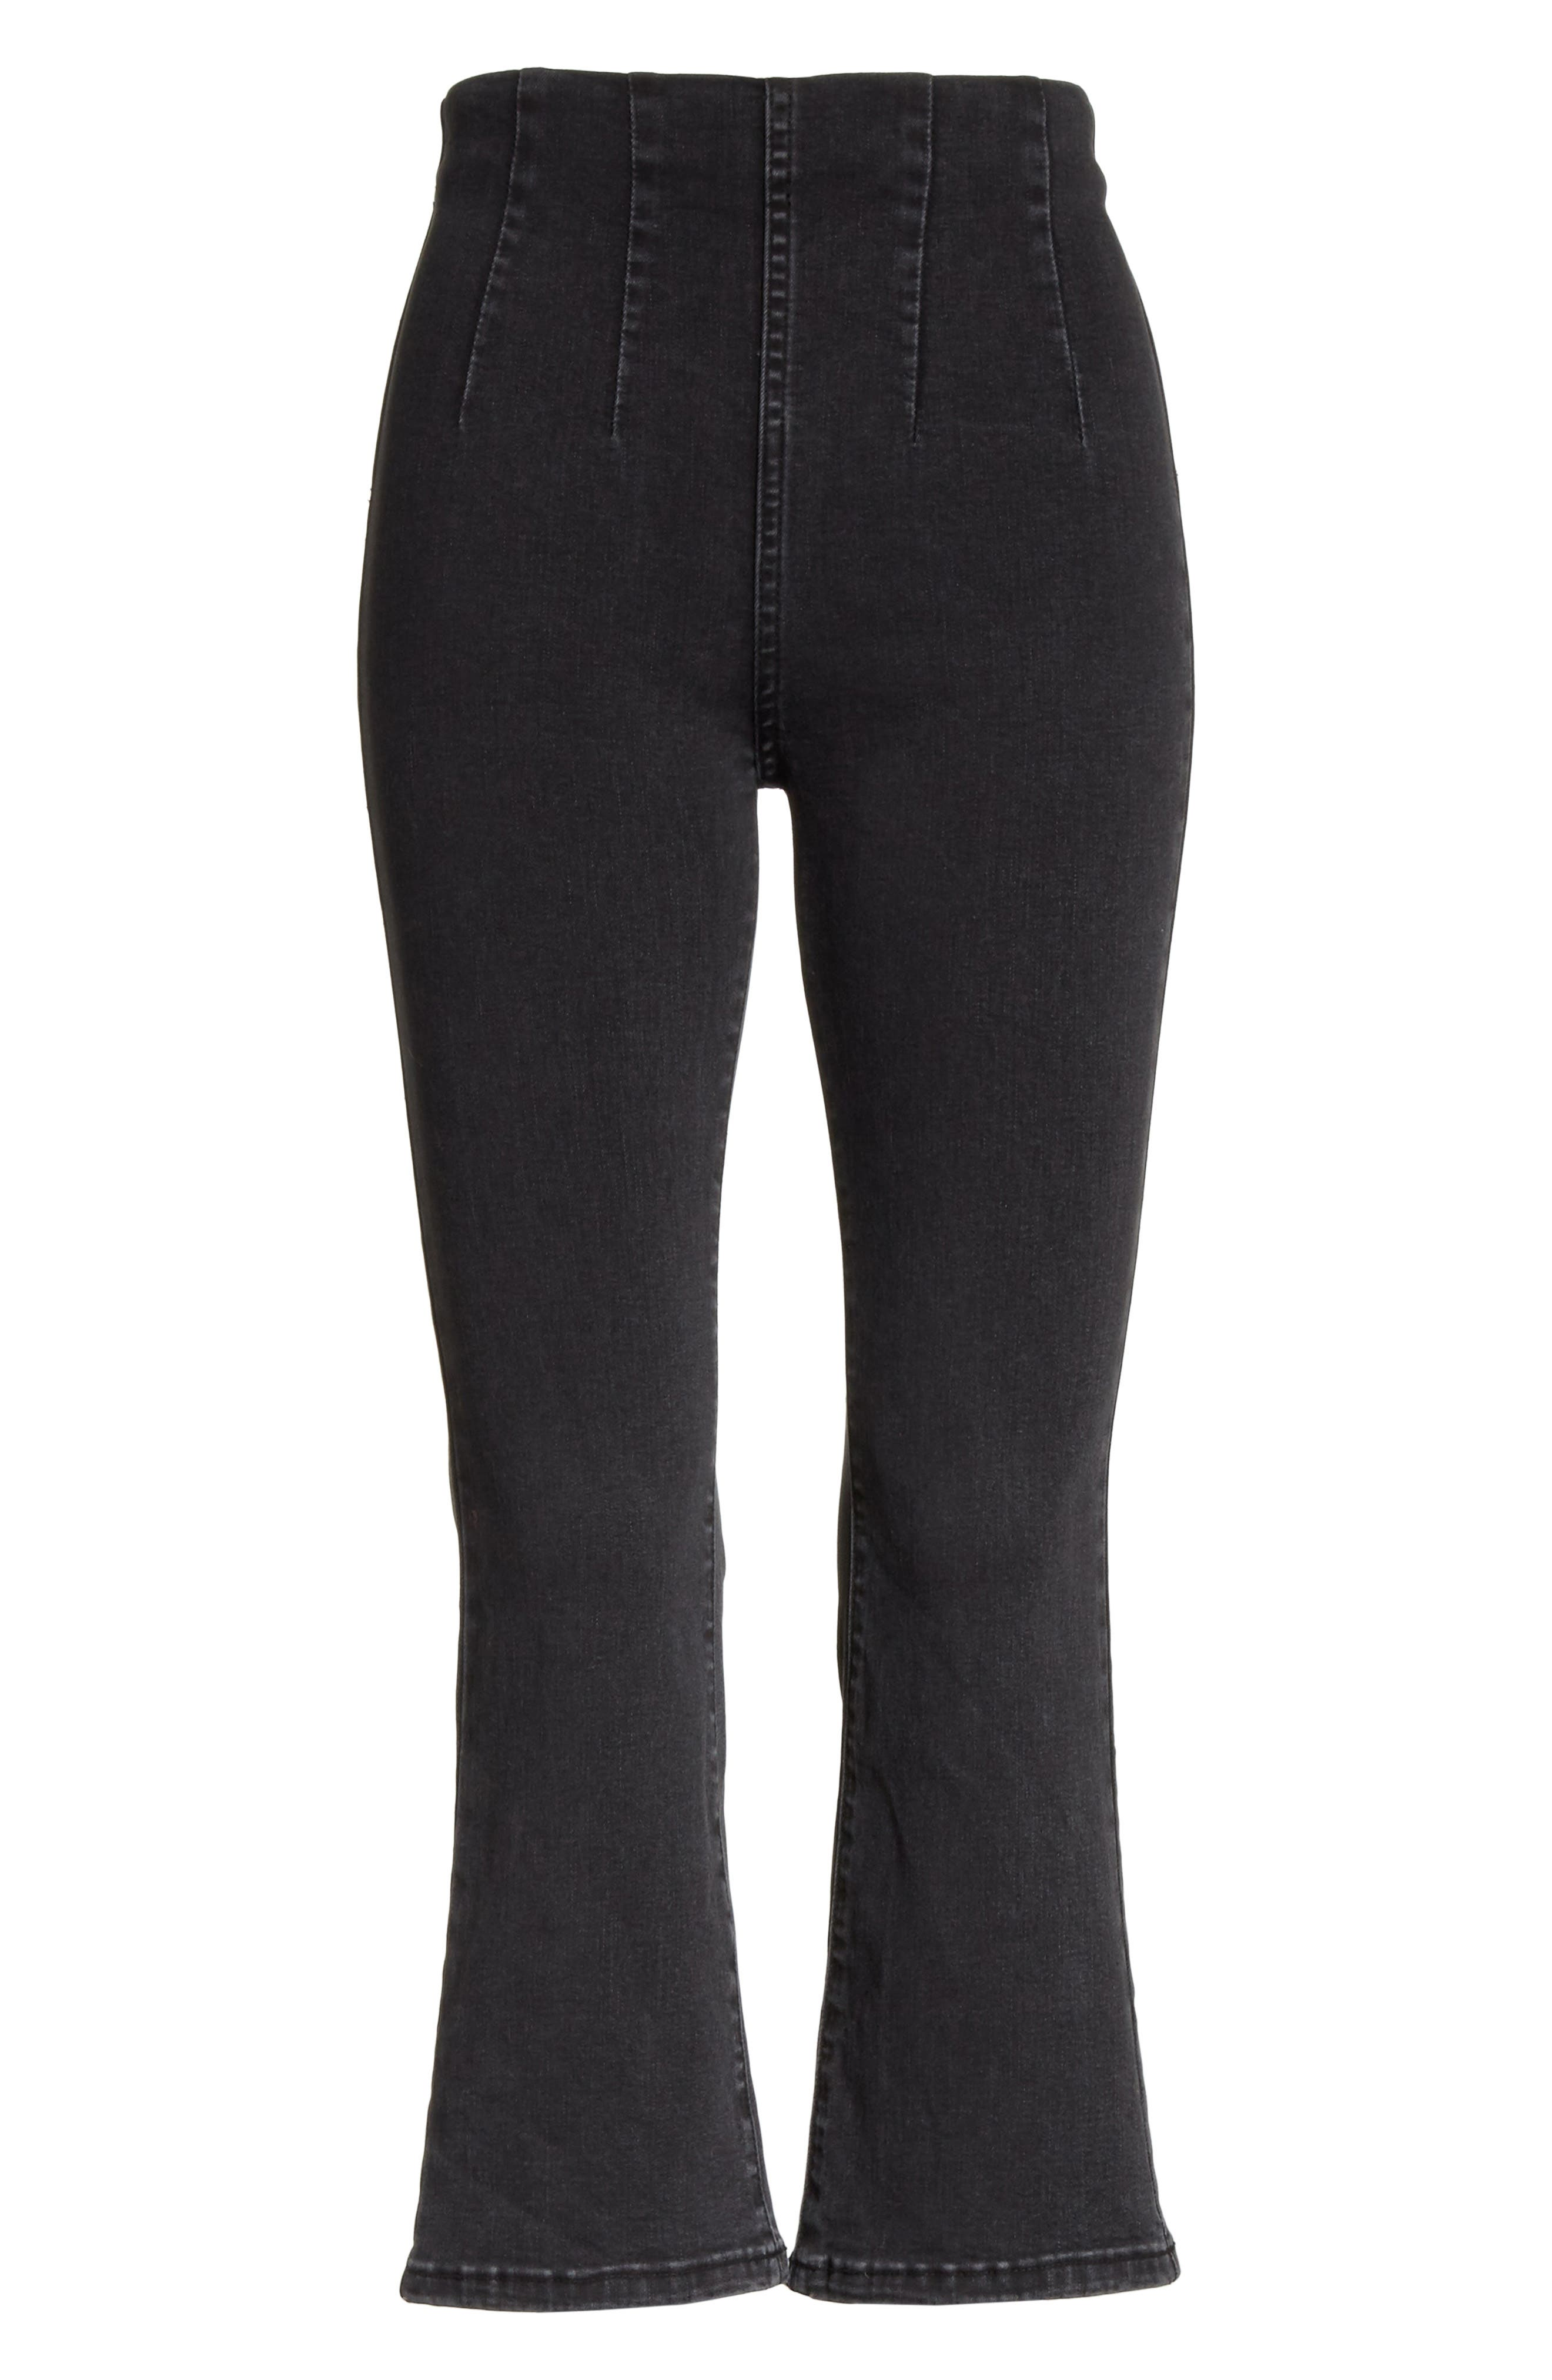 Ultra High Waist Crop Bootcut Jeans,                             Alternate thumbnail 7, color,                             001